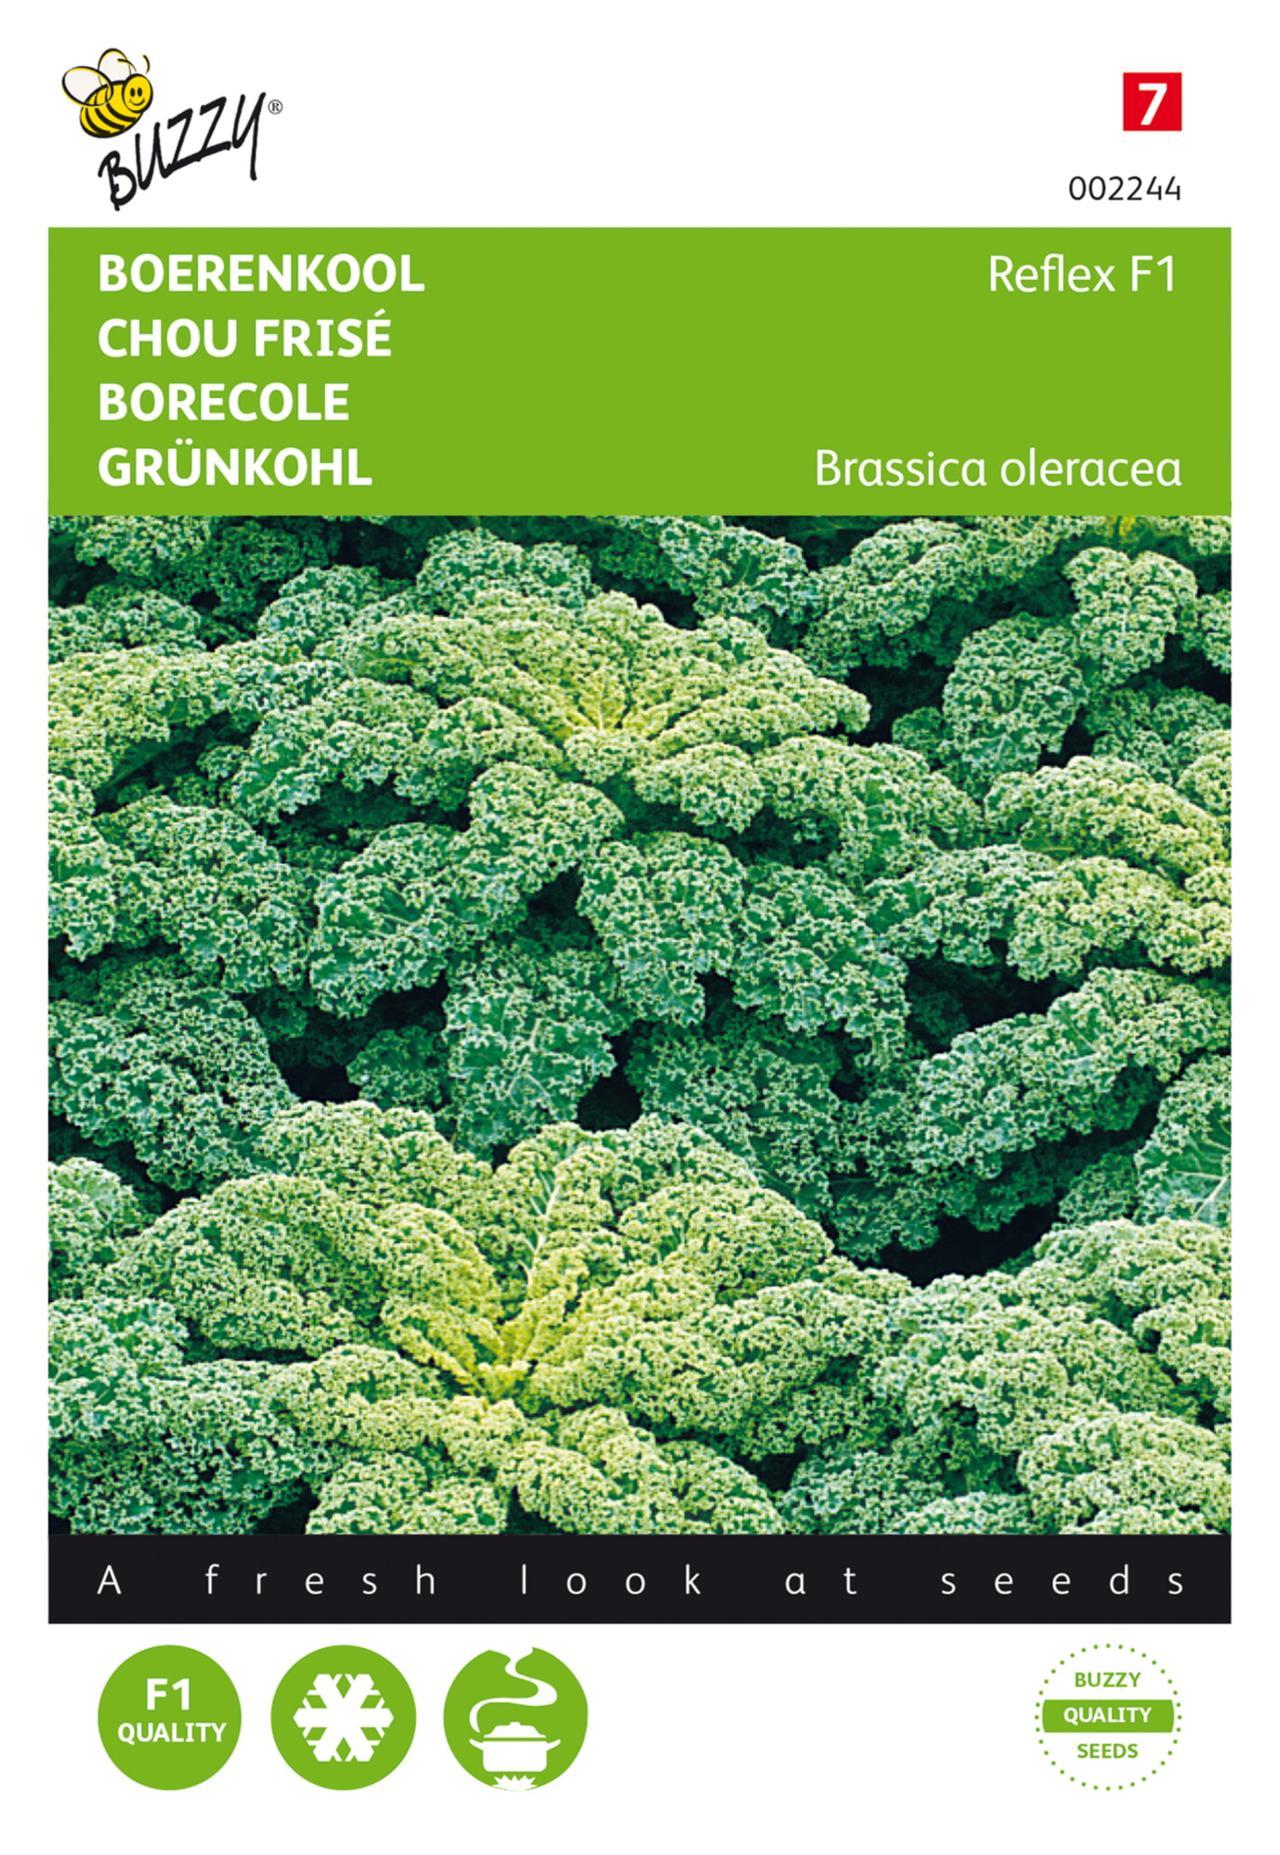 Brassica oleracea 'Reflex F1' plant